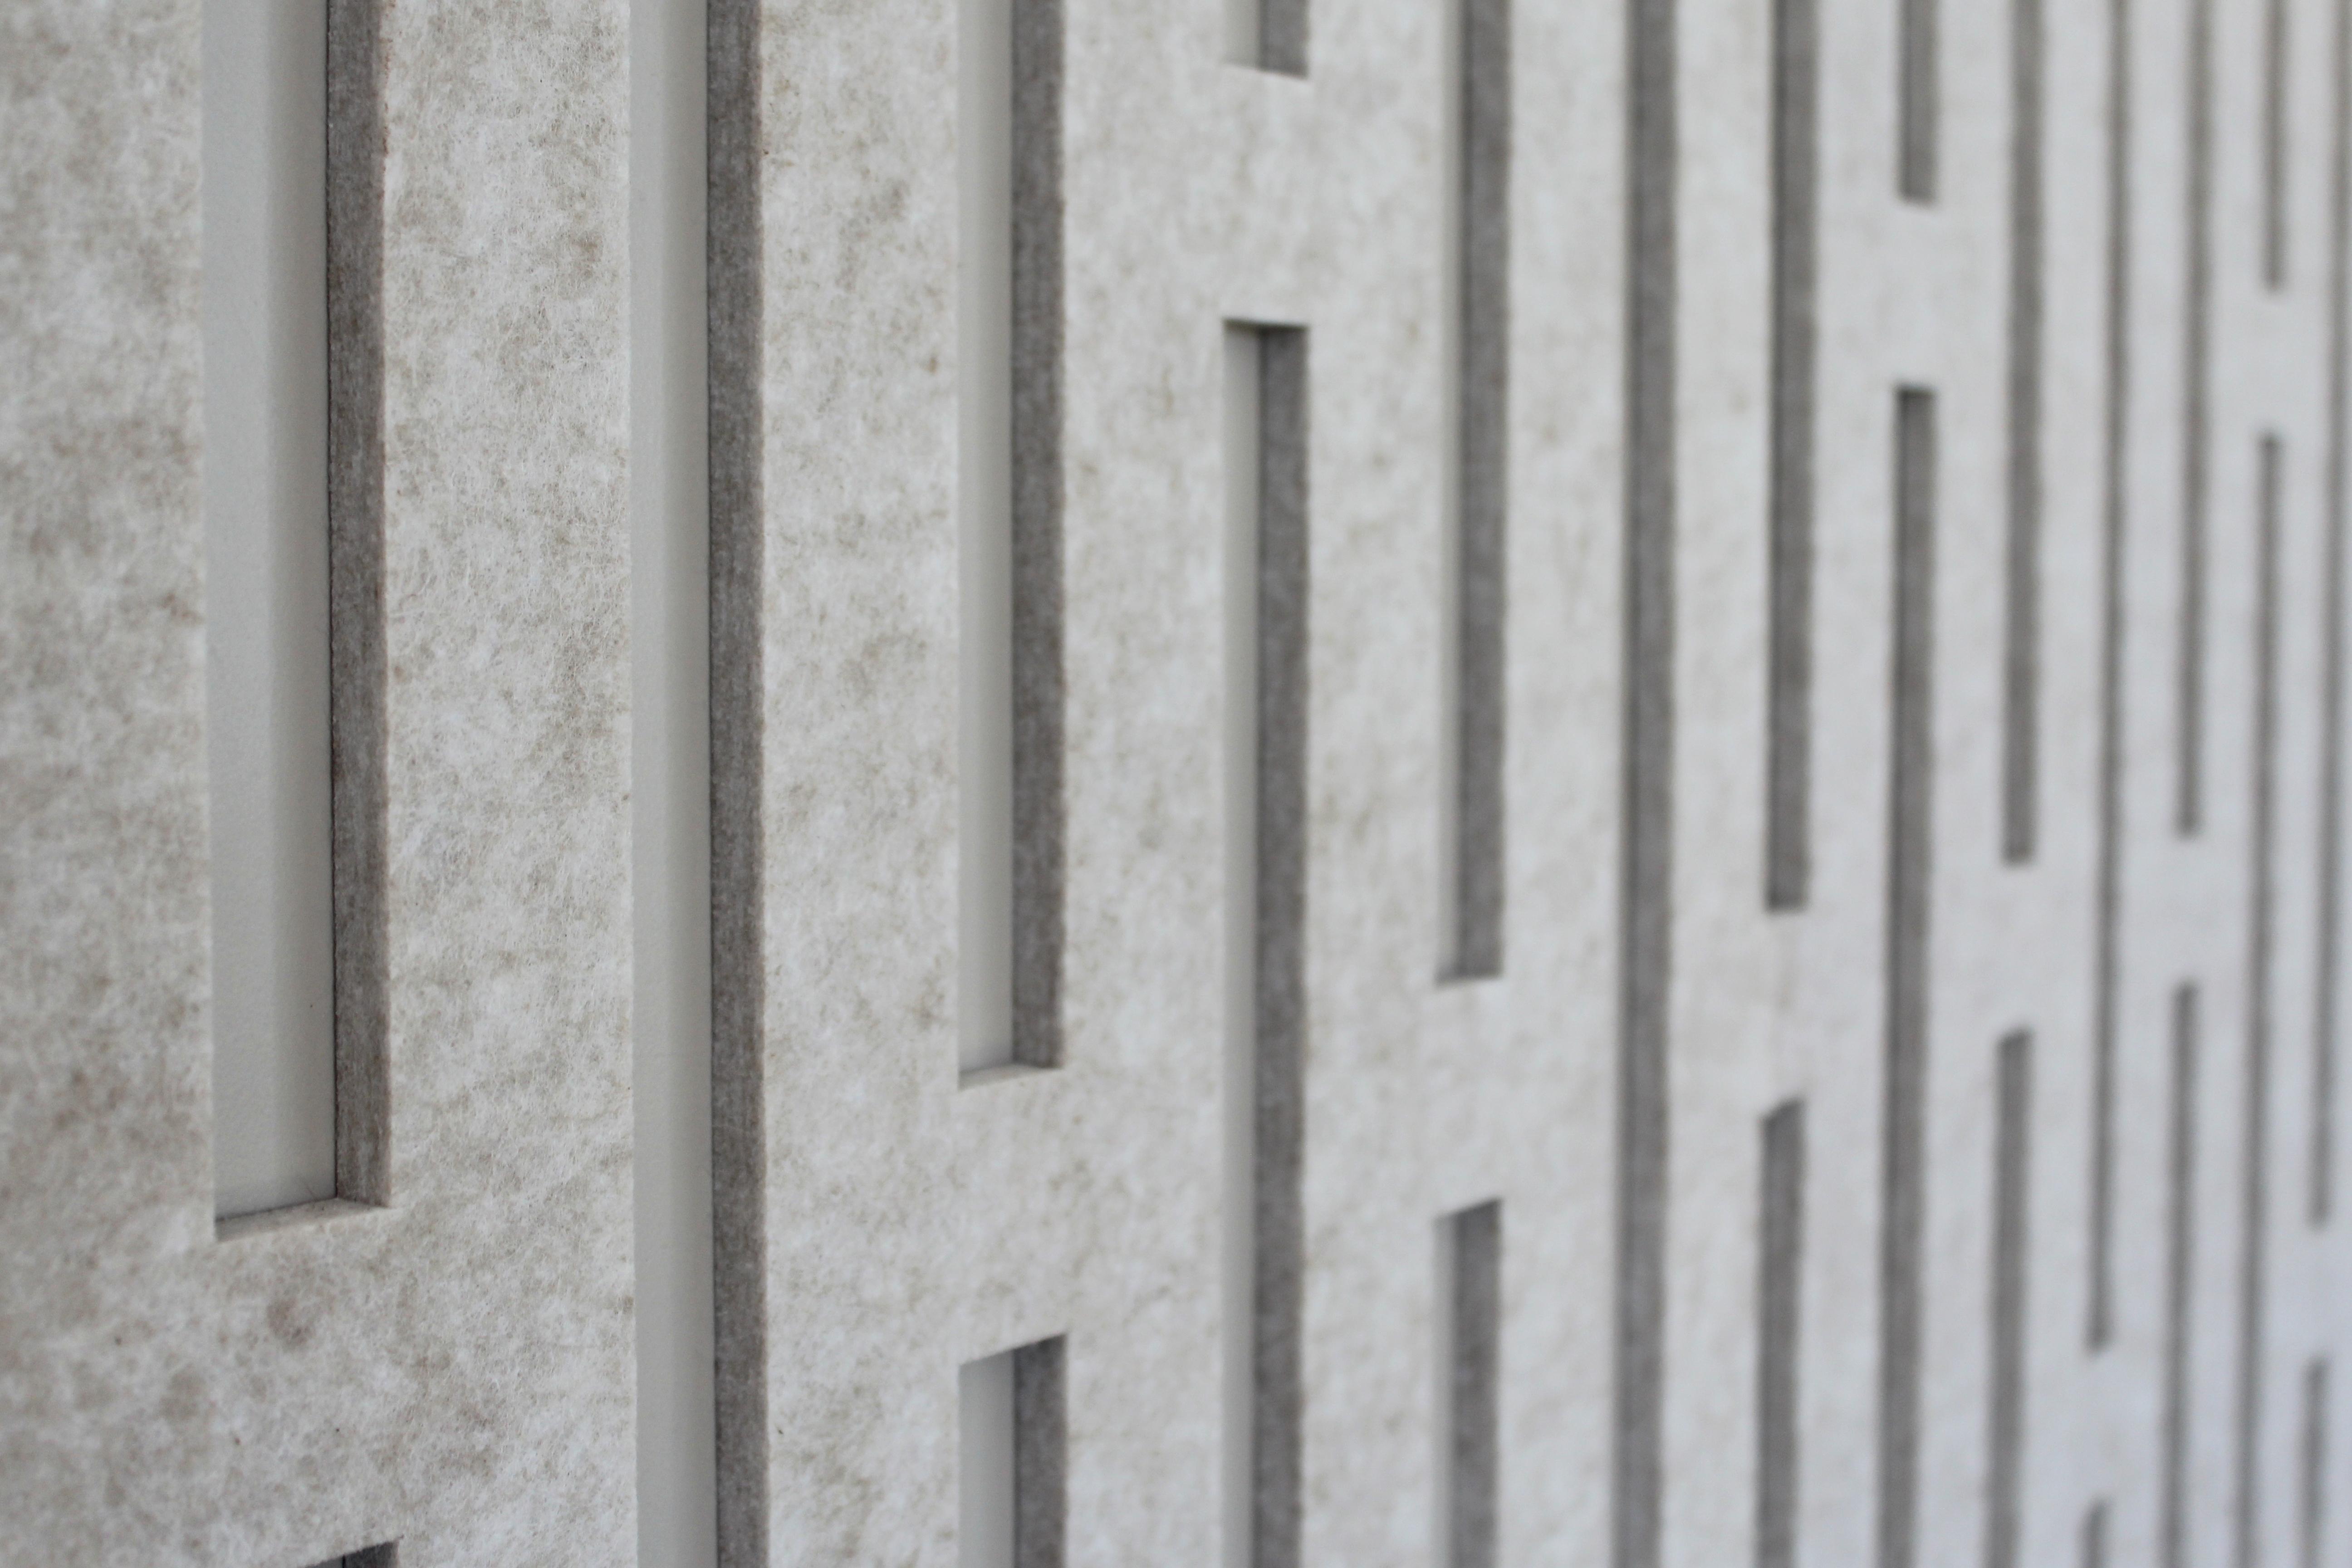 Alferink 11 – Thereca Projectinrichting